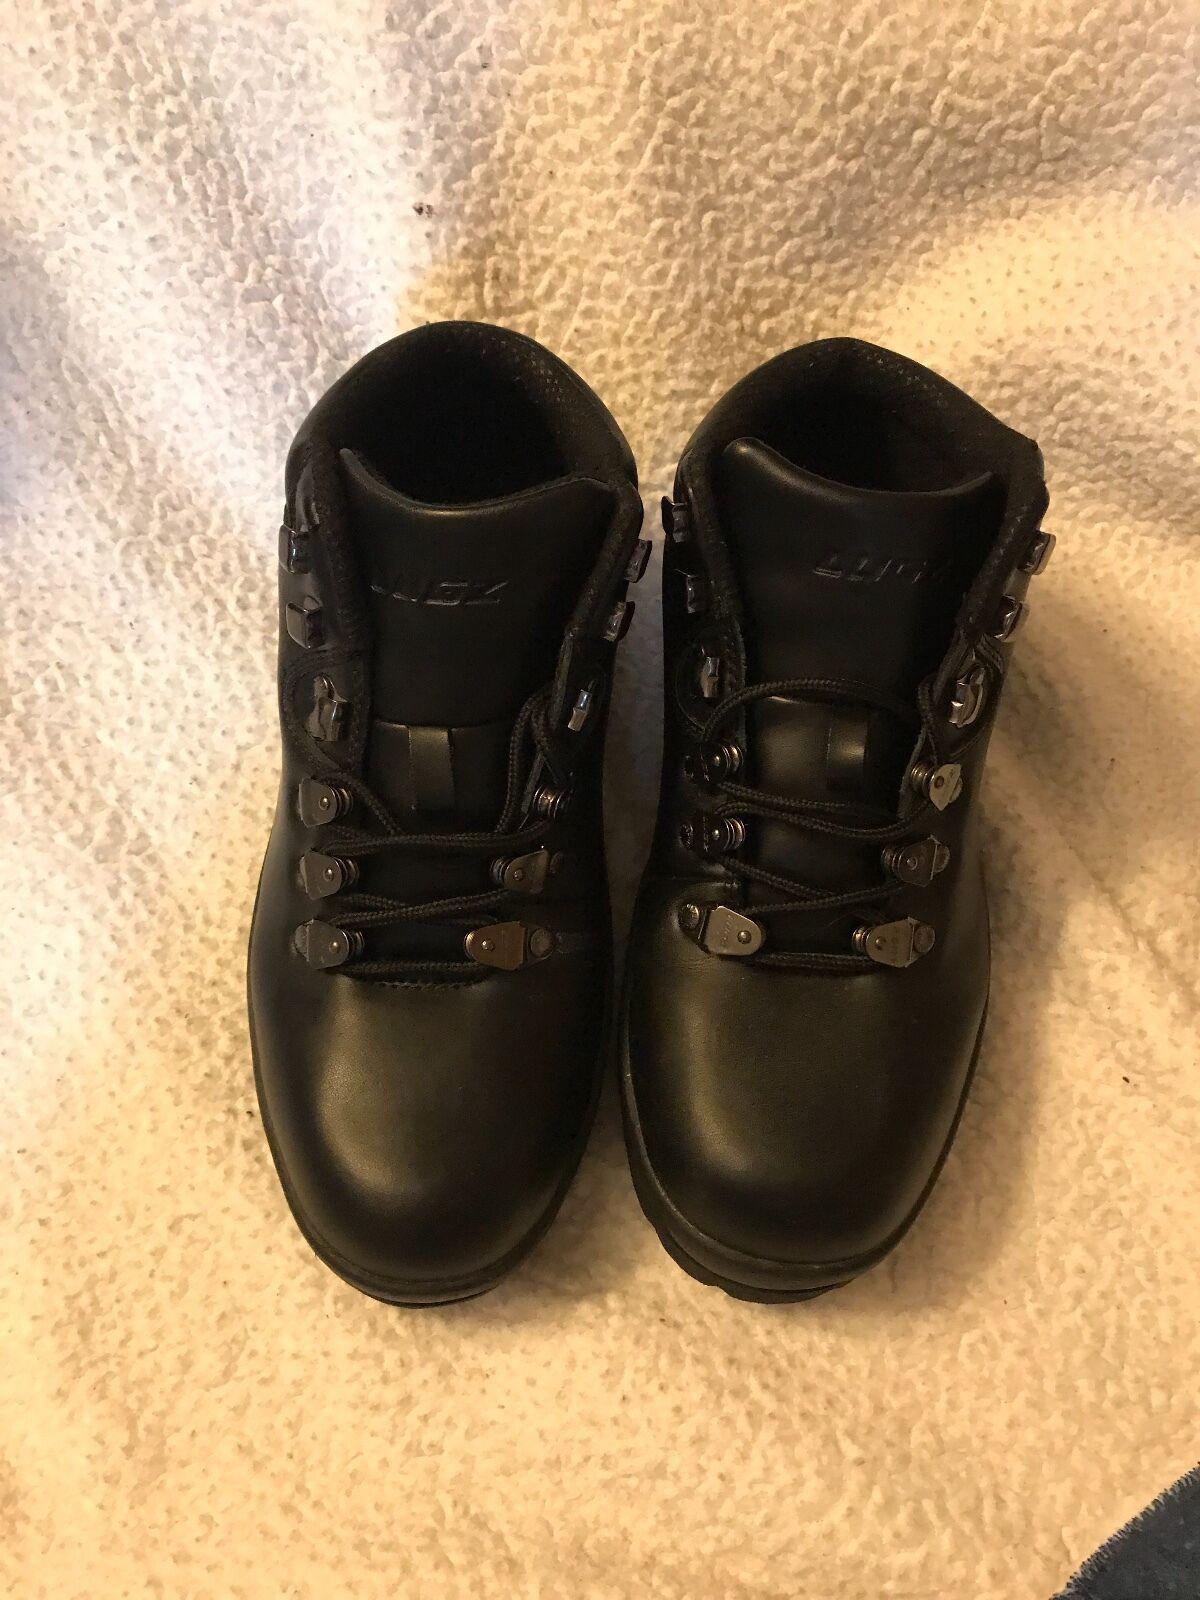 Mens Black Lugz Steel Toe Boots Size 8.5